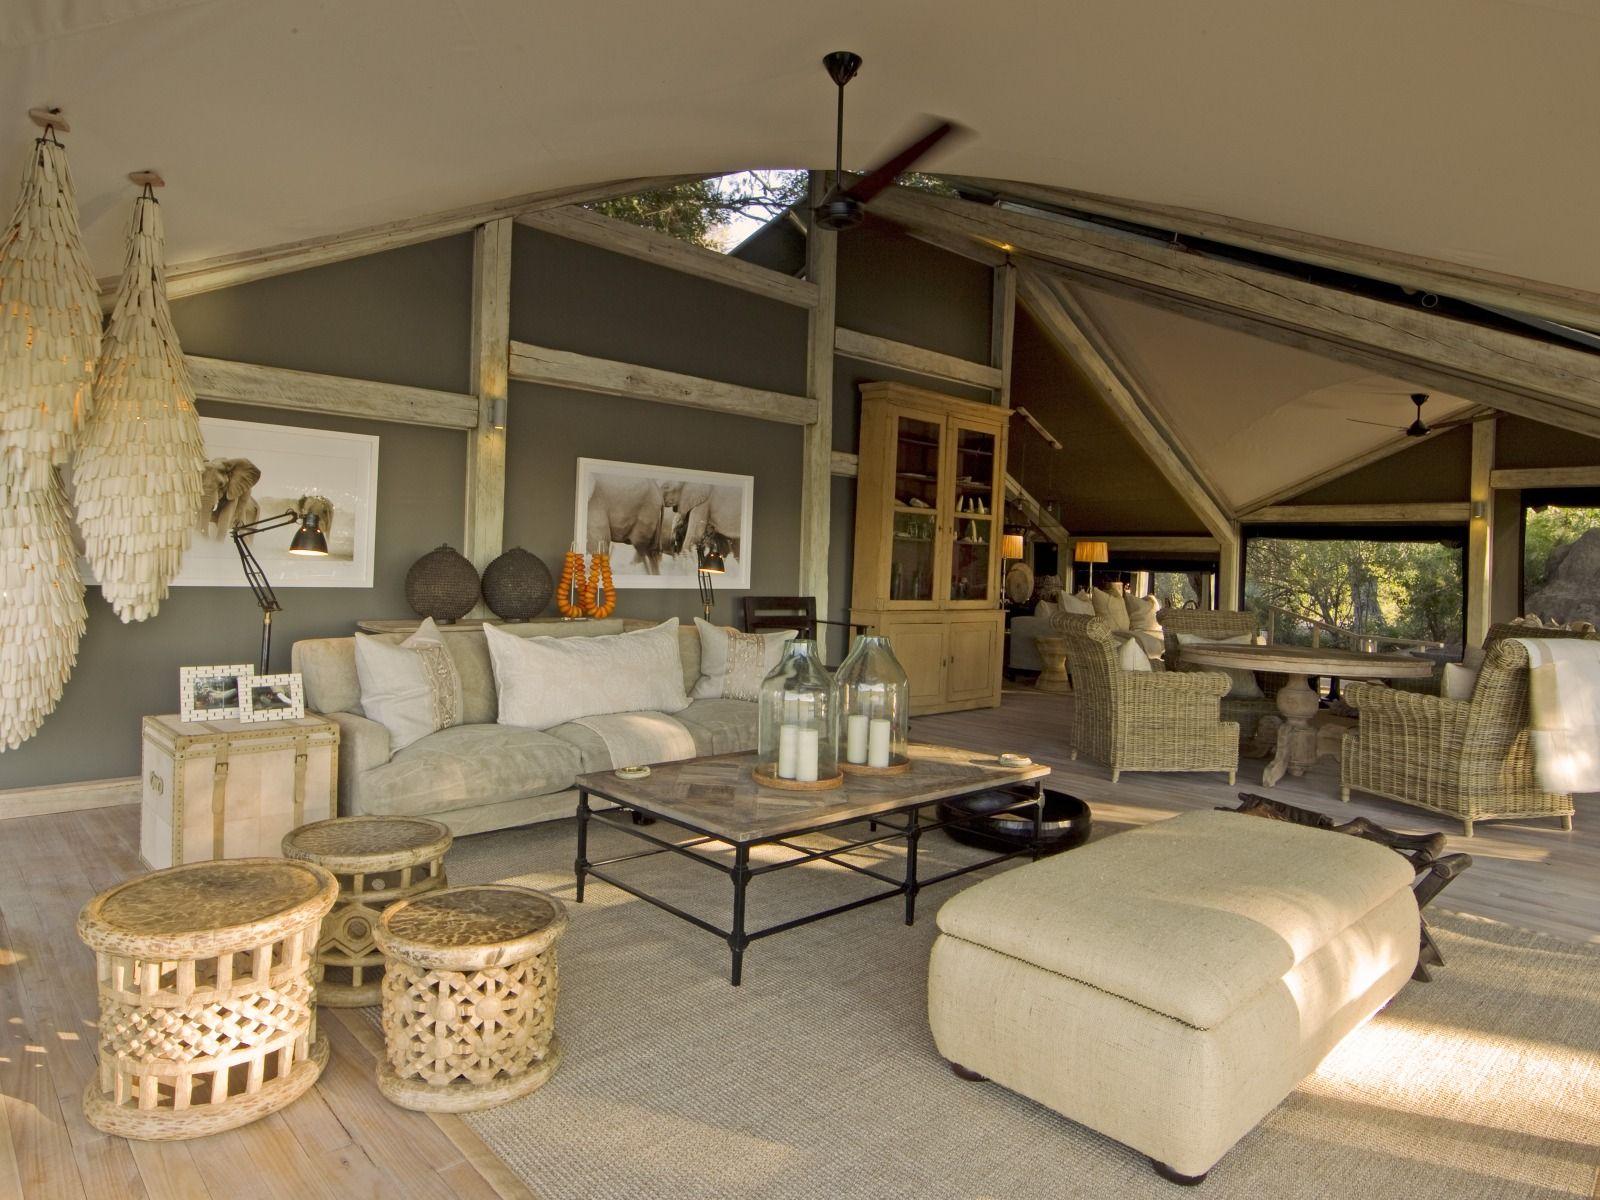 Safari Decor For Living Room Abu Camp Botswana Africa Botswana Design Interior Decor